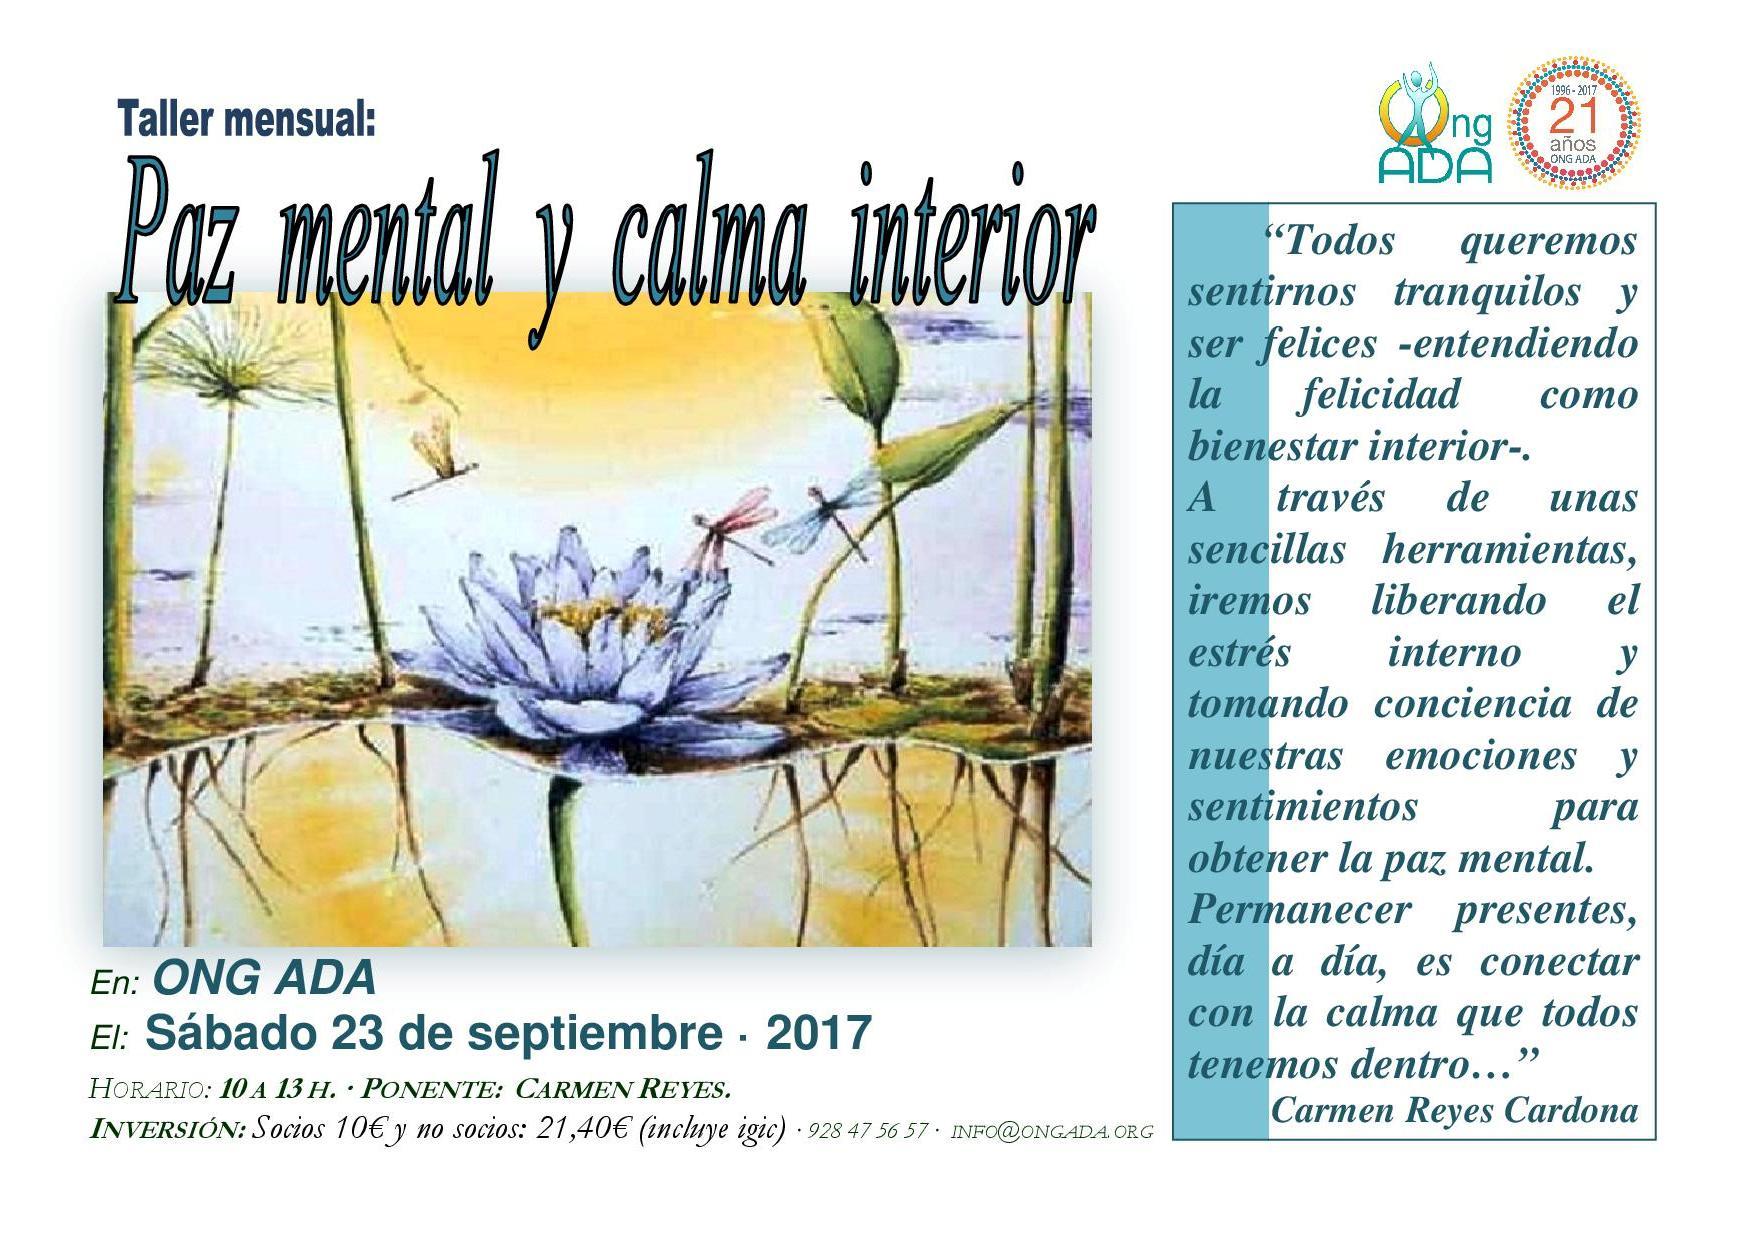 Taller Mensual 2017. Paz mental, calma interior.RED